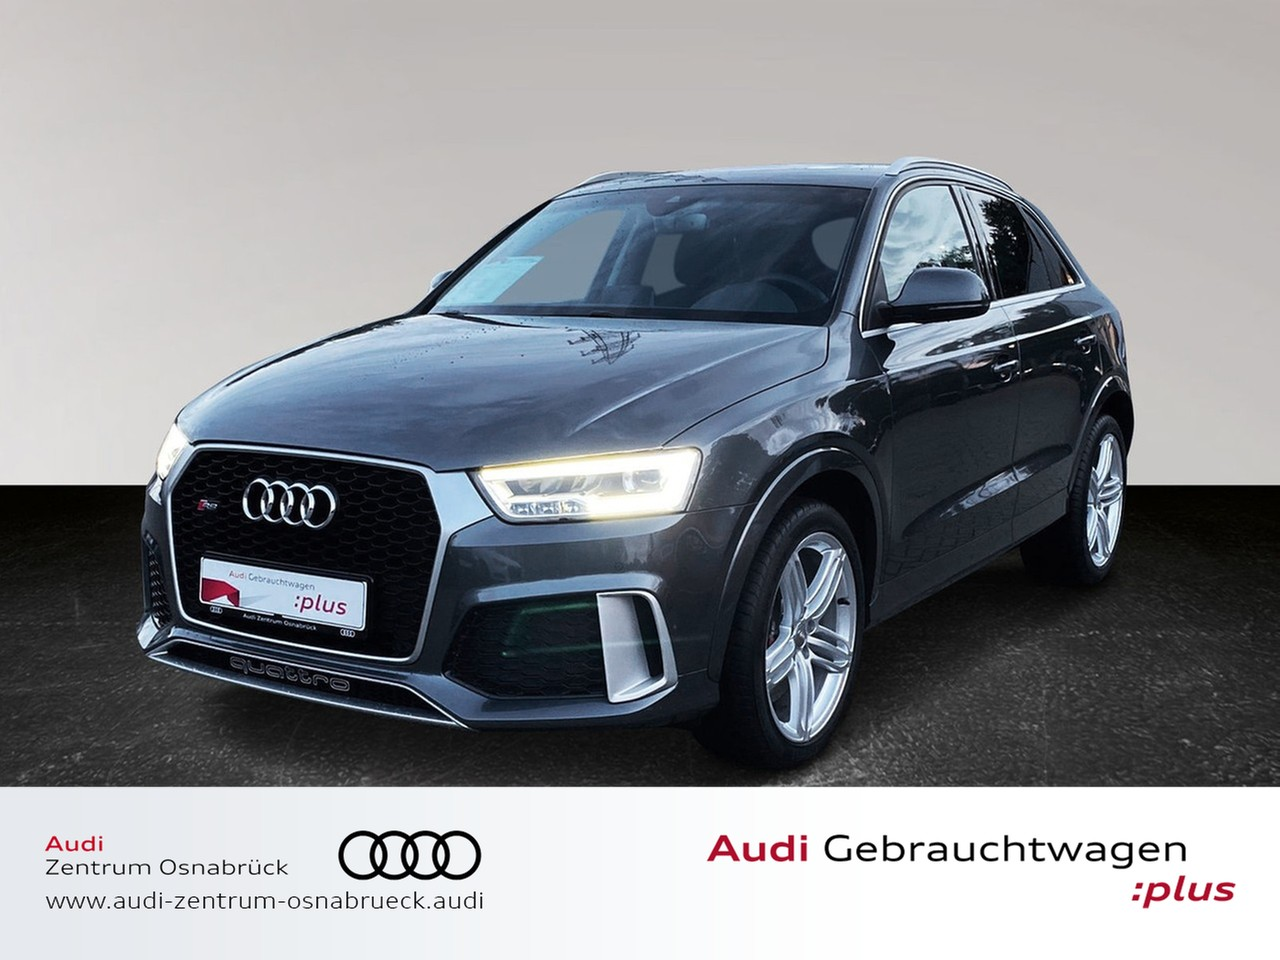 Audi RS Q3 2.5 TFSI S tronic quattro Navi RFK Pano BOSE DAB el. Heckklappe Optikpaket Komfortschlüssel, Jahr 2015, Benzin